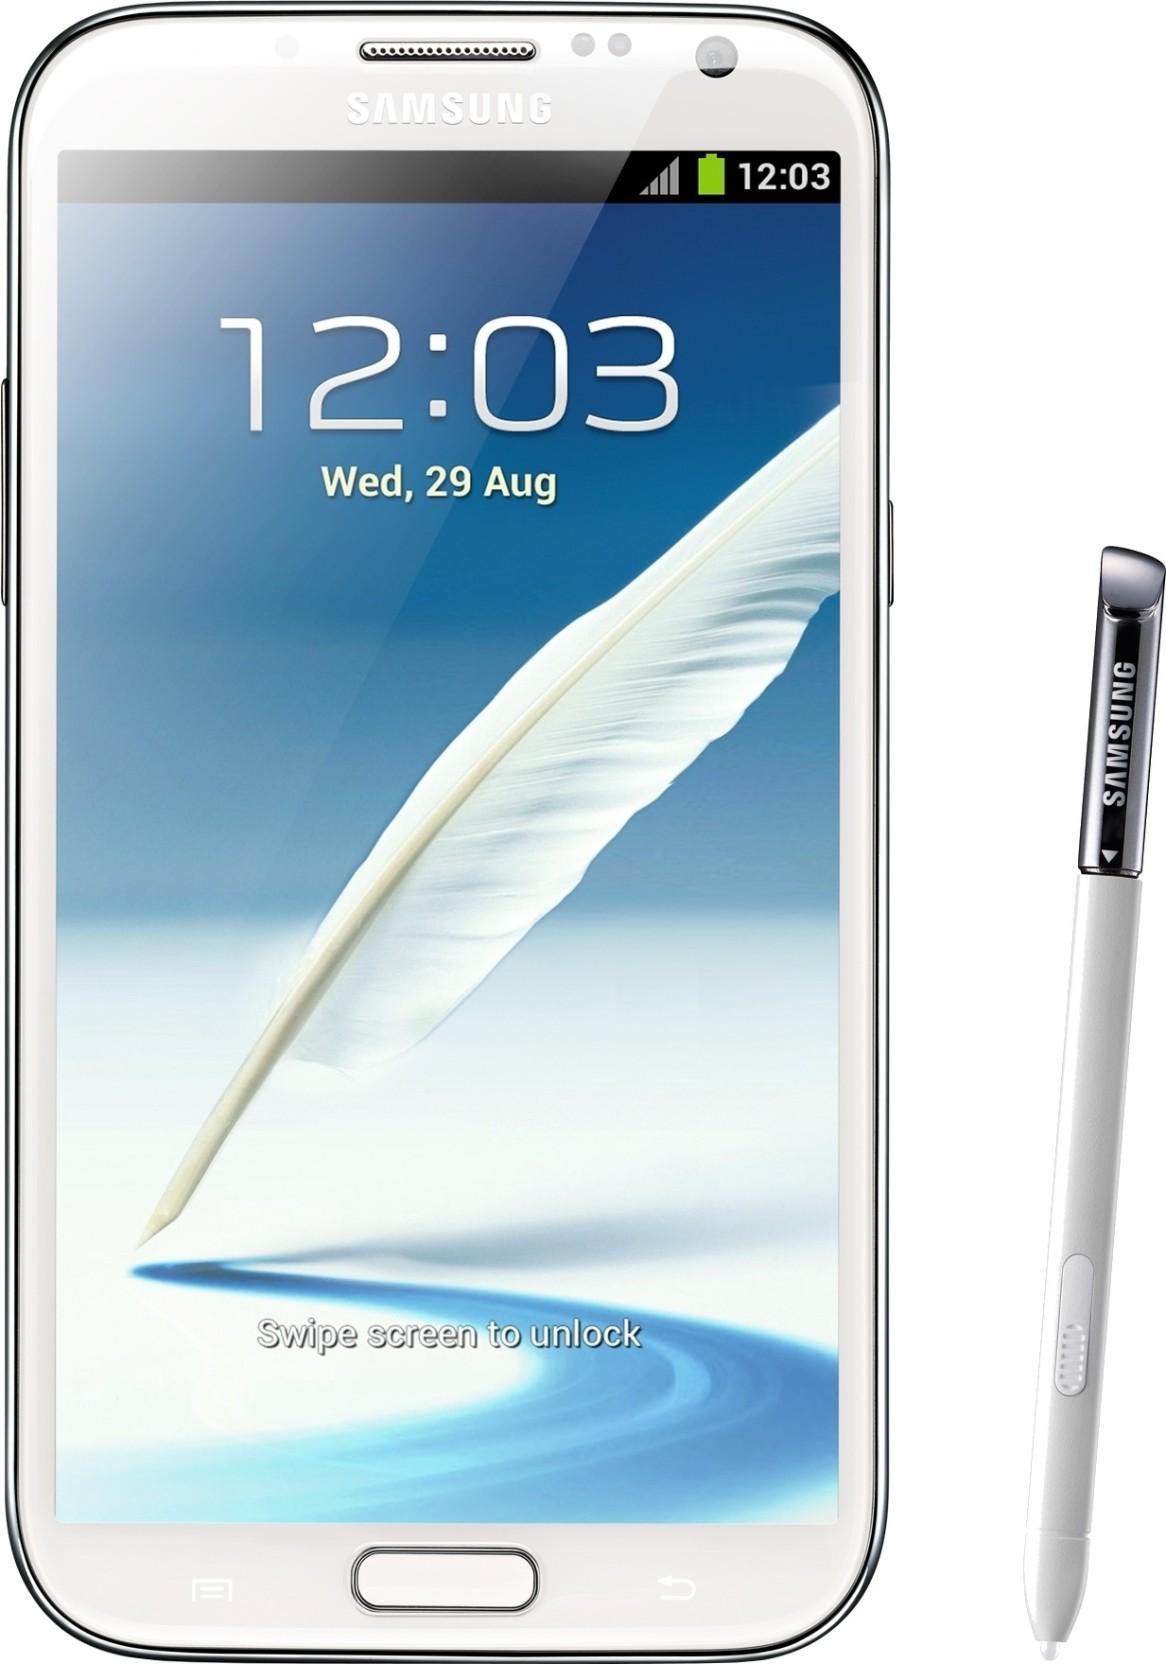 Samsung Galaxy Note 2 Marble White 16 Gb Online At Best Price Xiaomi Redmi Ram Internal Compare